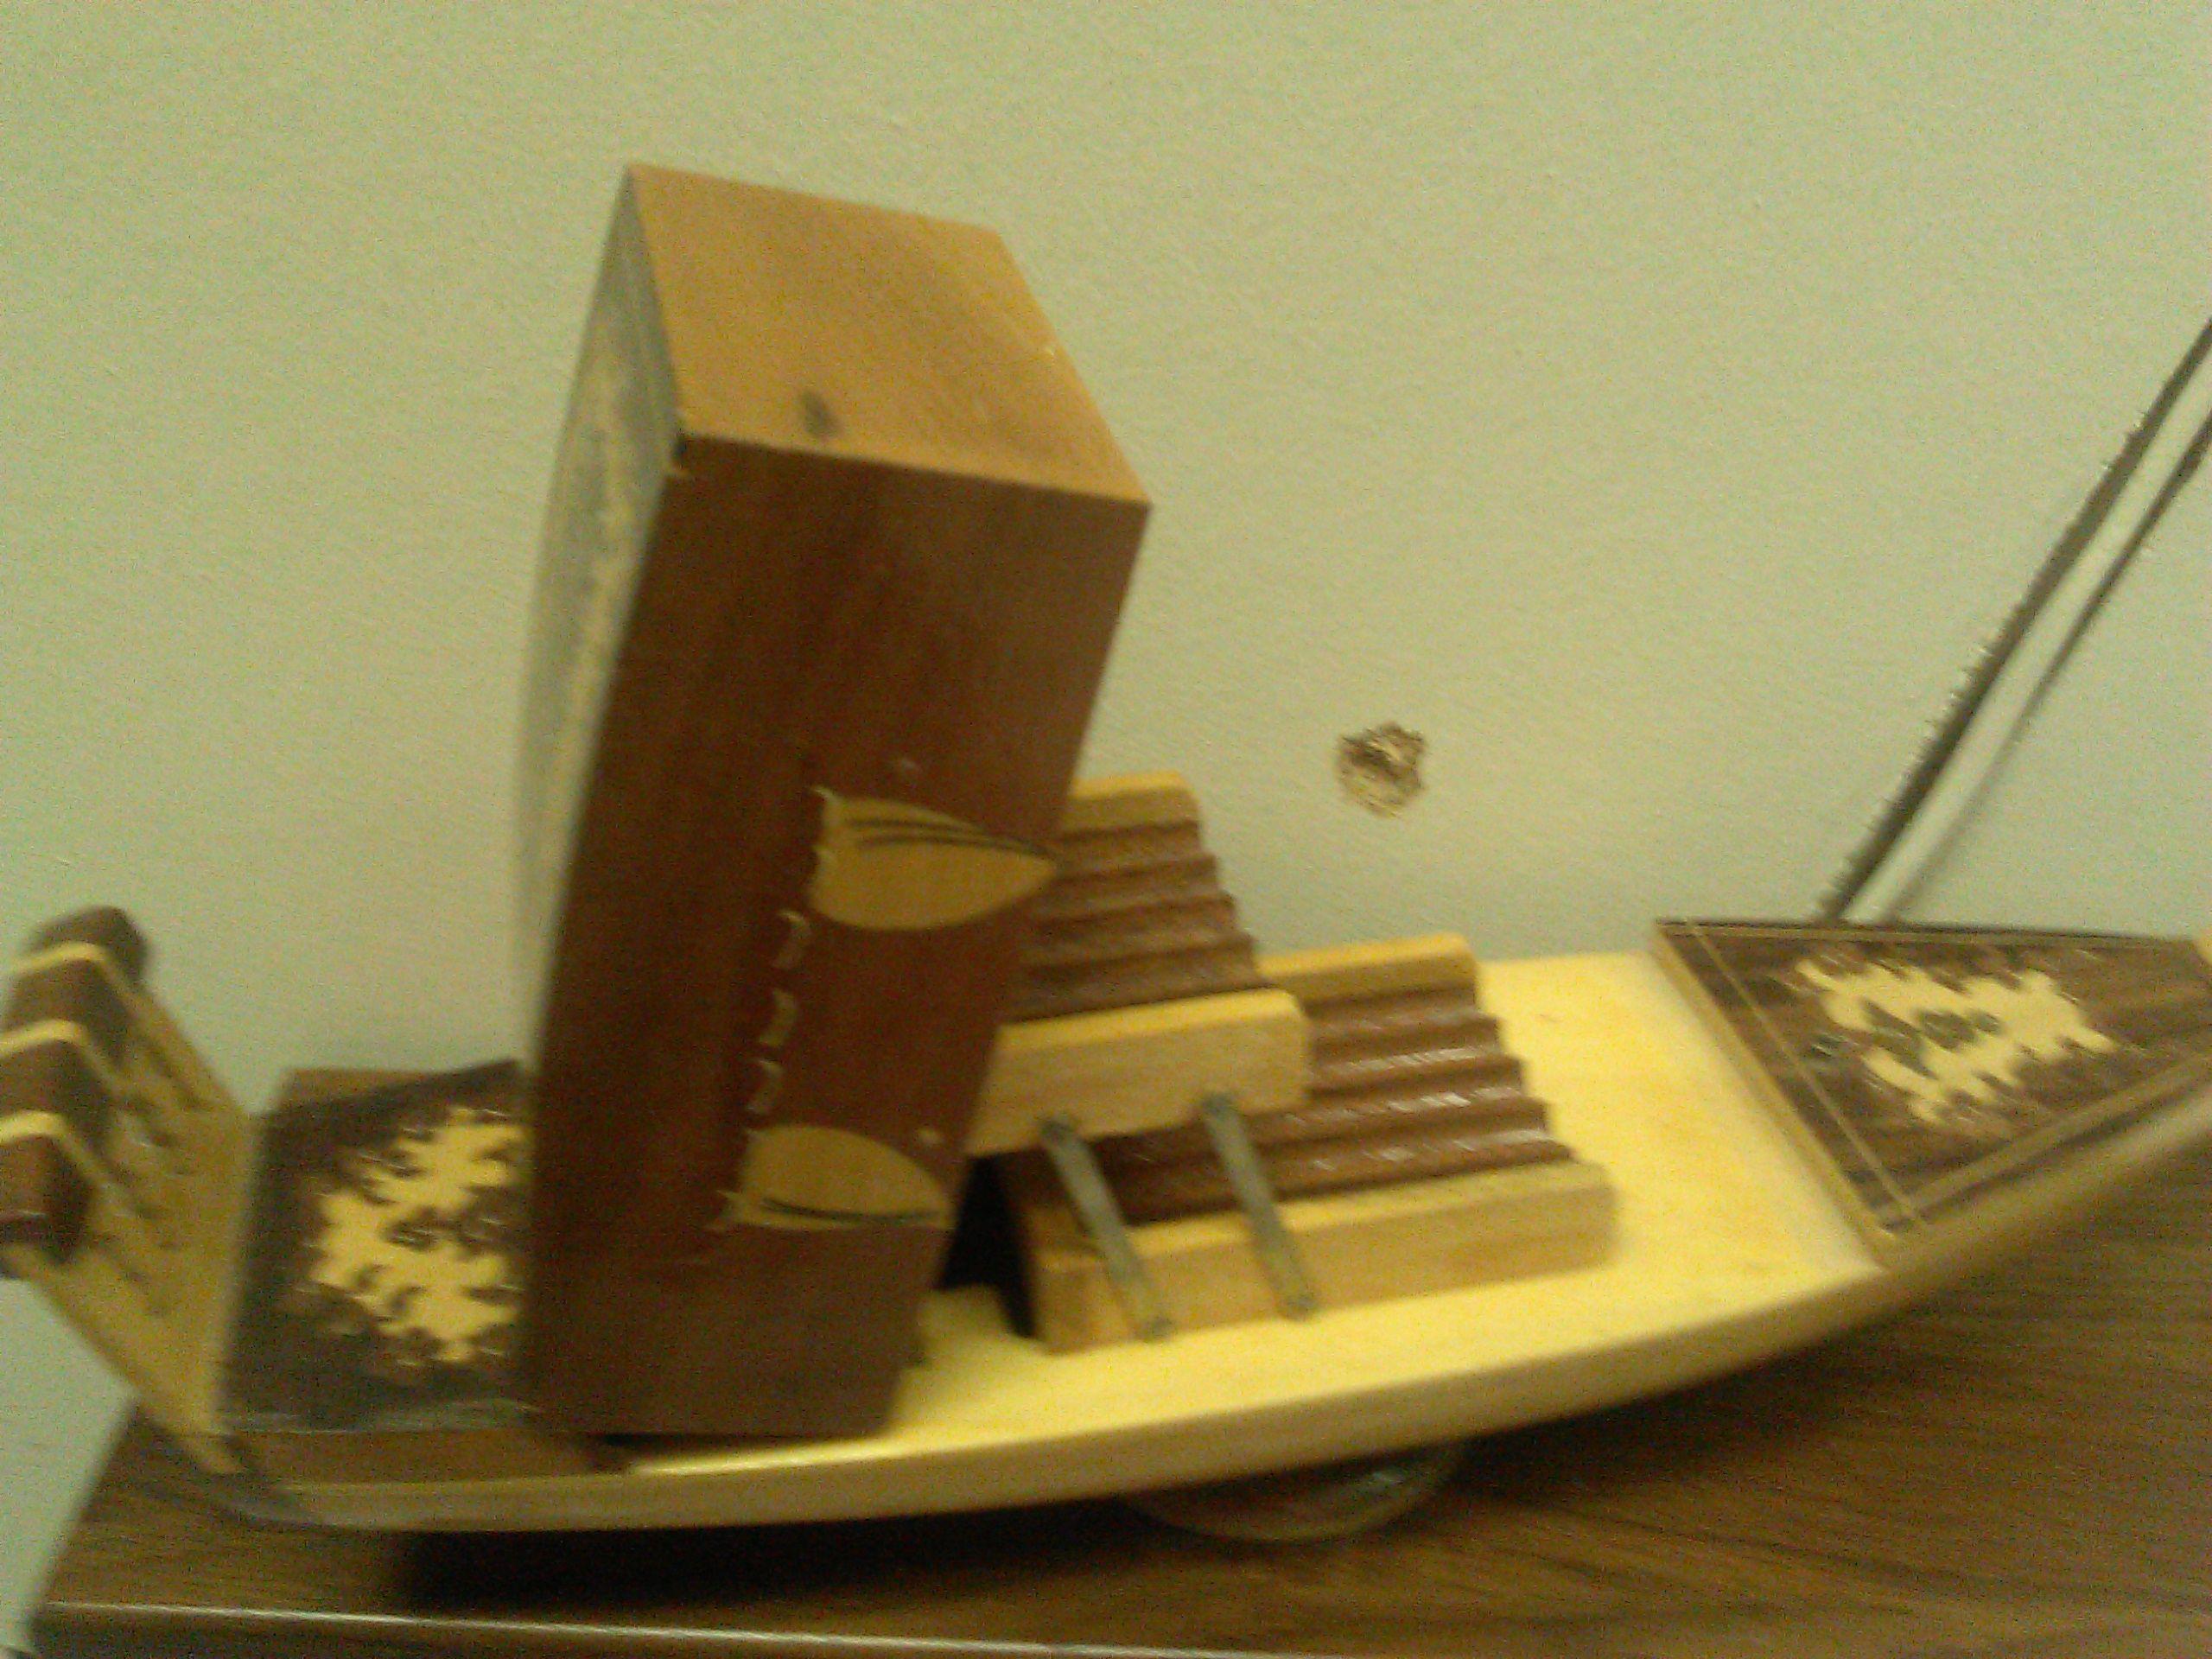 Neat vintage gondola cigarette dispenser. Dispenses cigarettes and is musical.